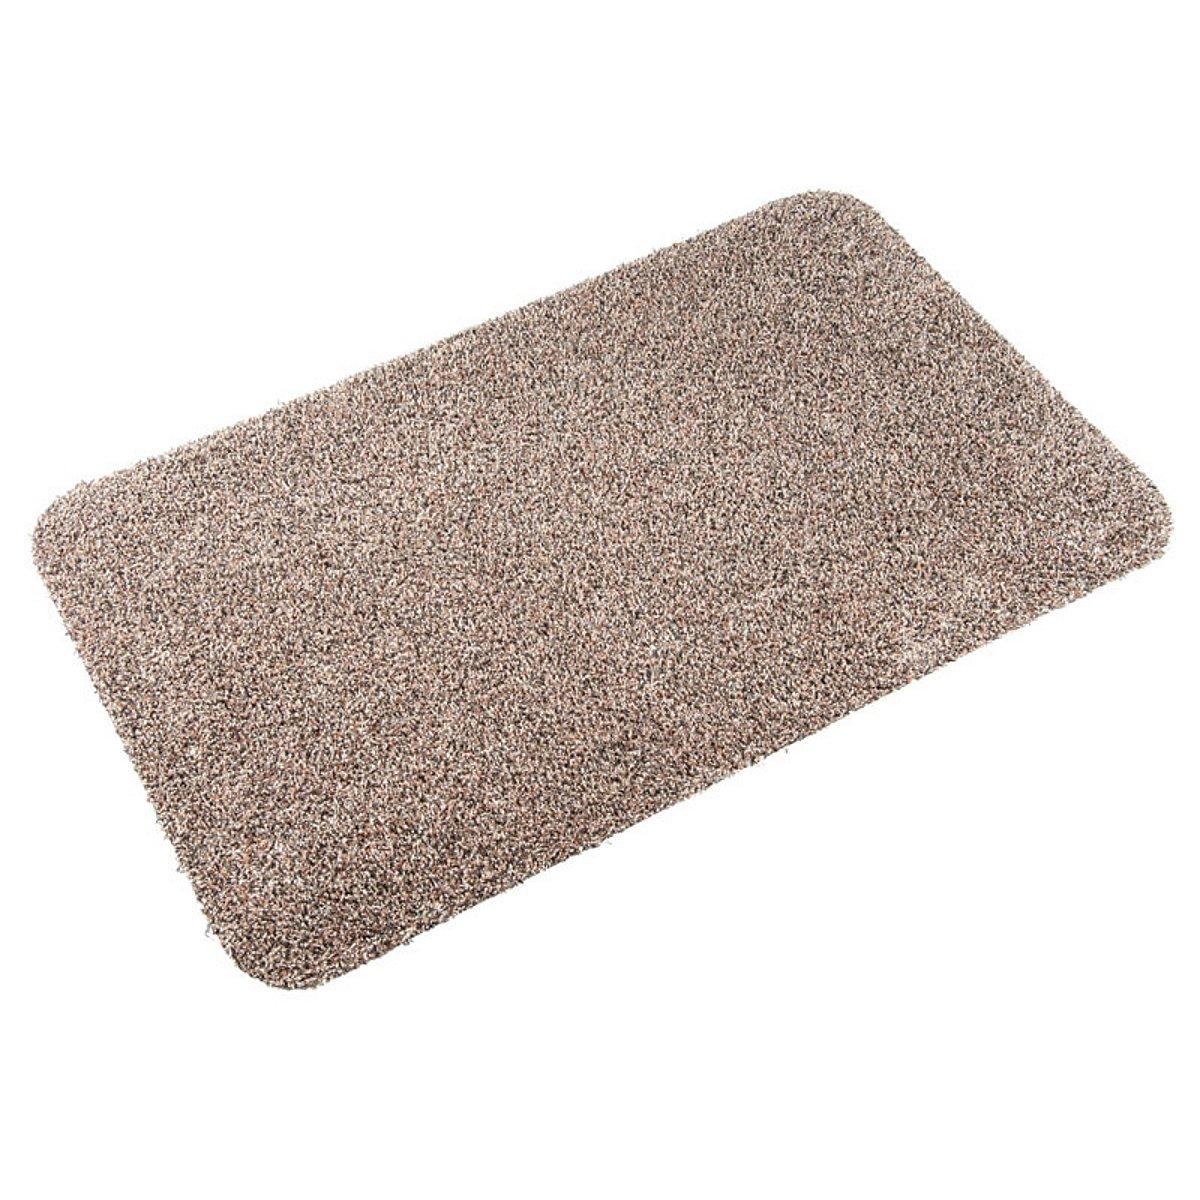 casa pura Entrance Door Mat | Highly Absorbent, 100% Cotton Pile | Machine Washable | Beige, 40x60cm